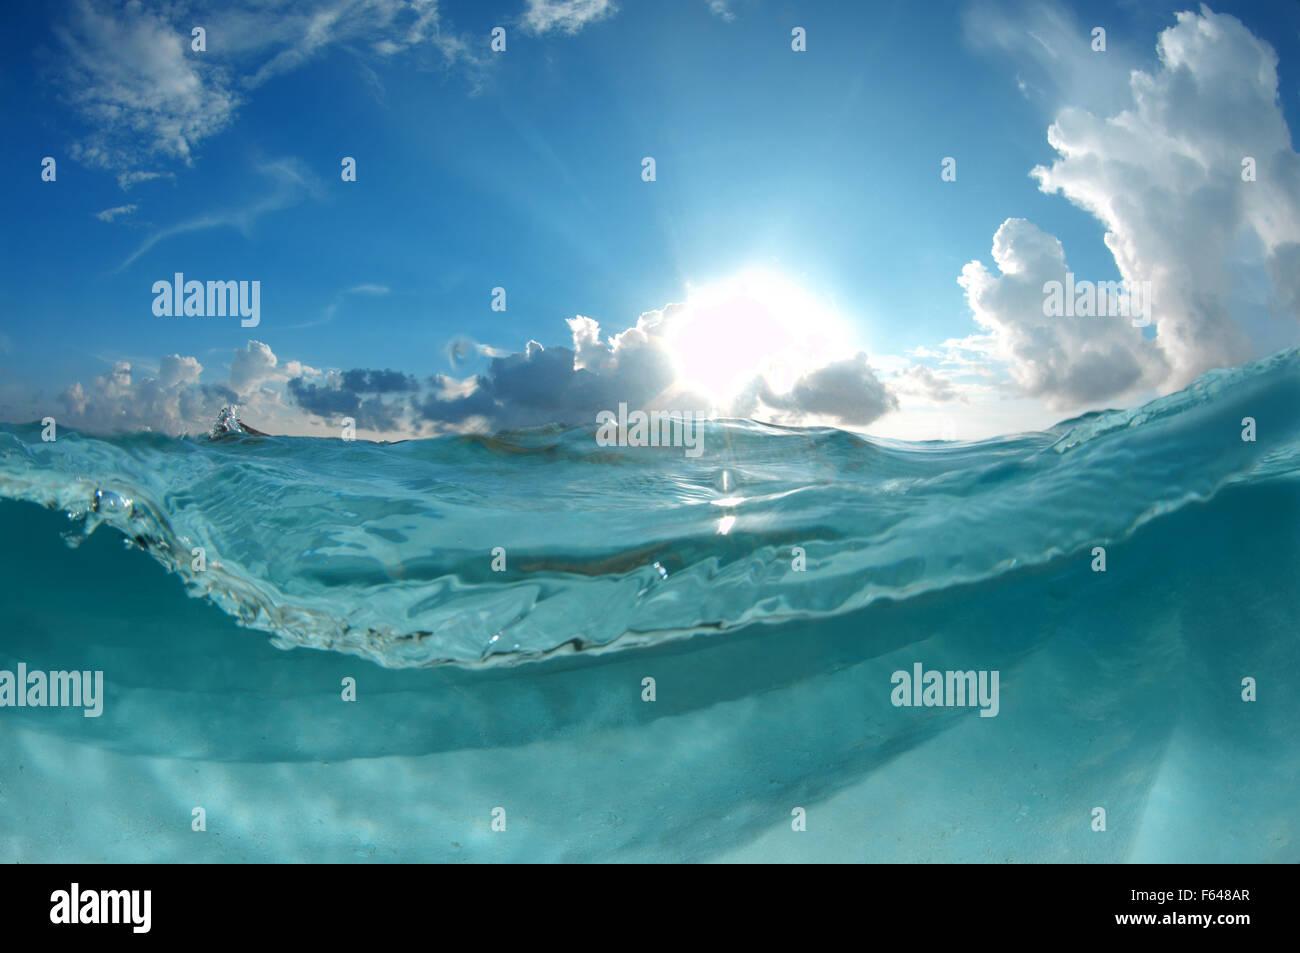 Split level underwater landscape, Indian Ocean, Maldives - Stock Image